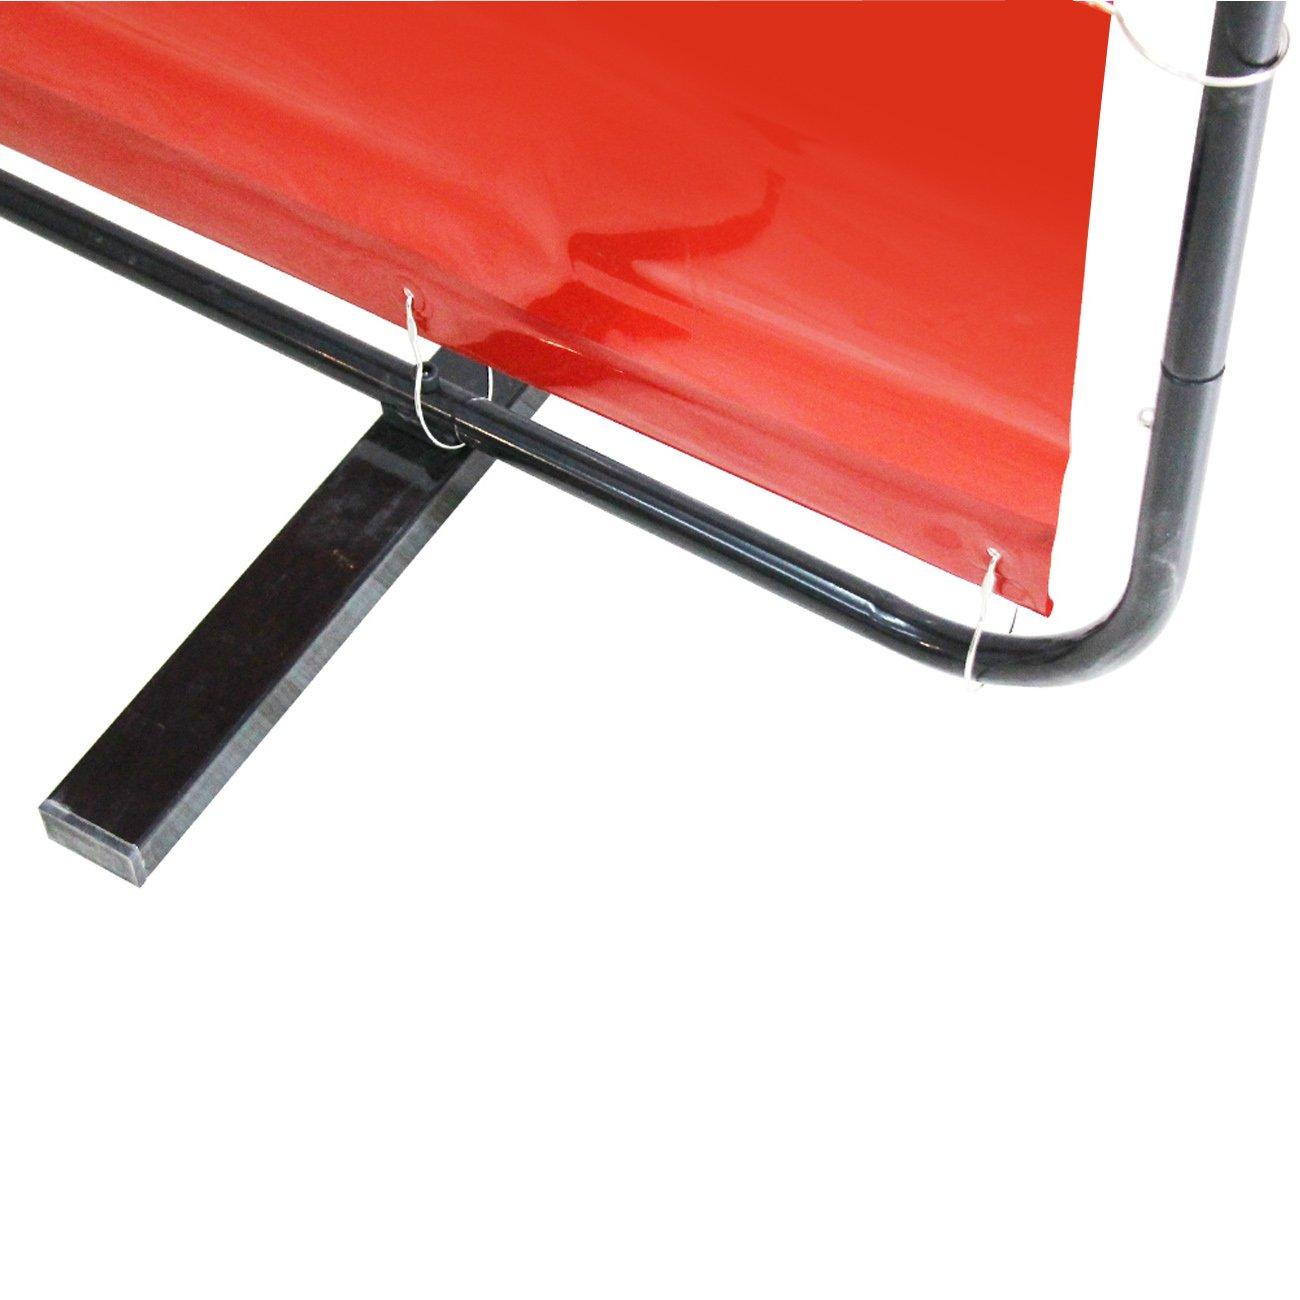 VIZ-PRO Red Vinyl Welding Curtain/Welding Screen With Frame, 6' x 6' by VIZ-PRO (Image #5)